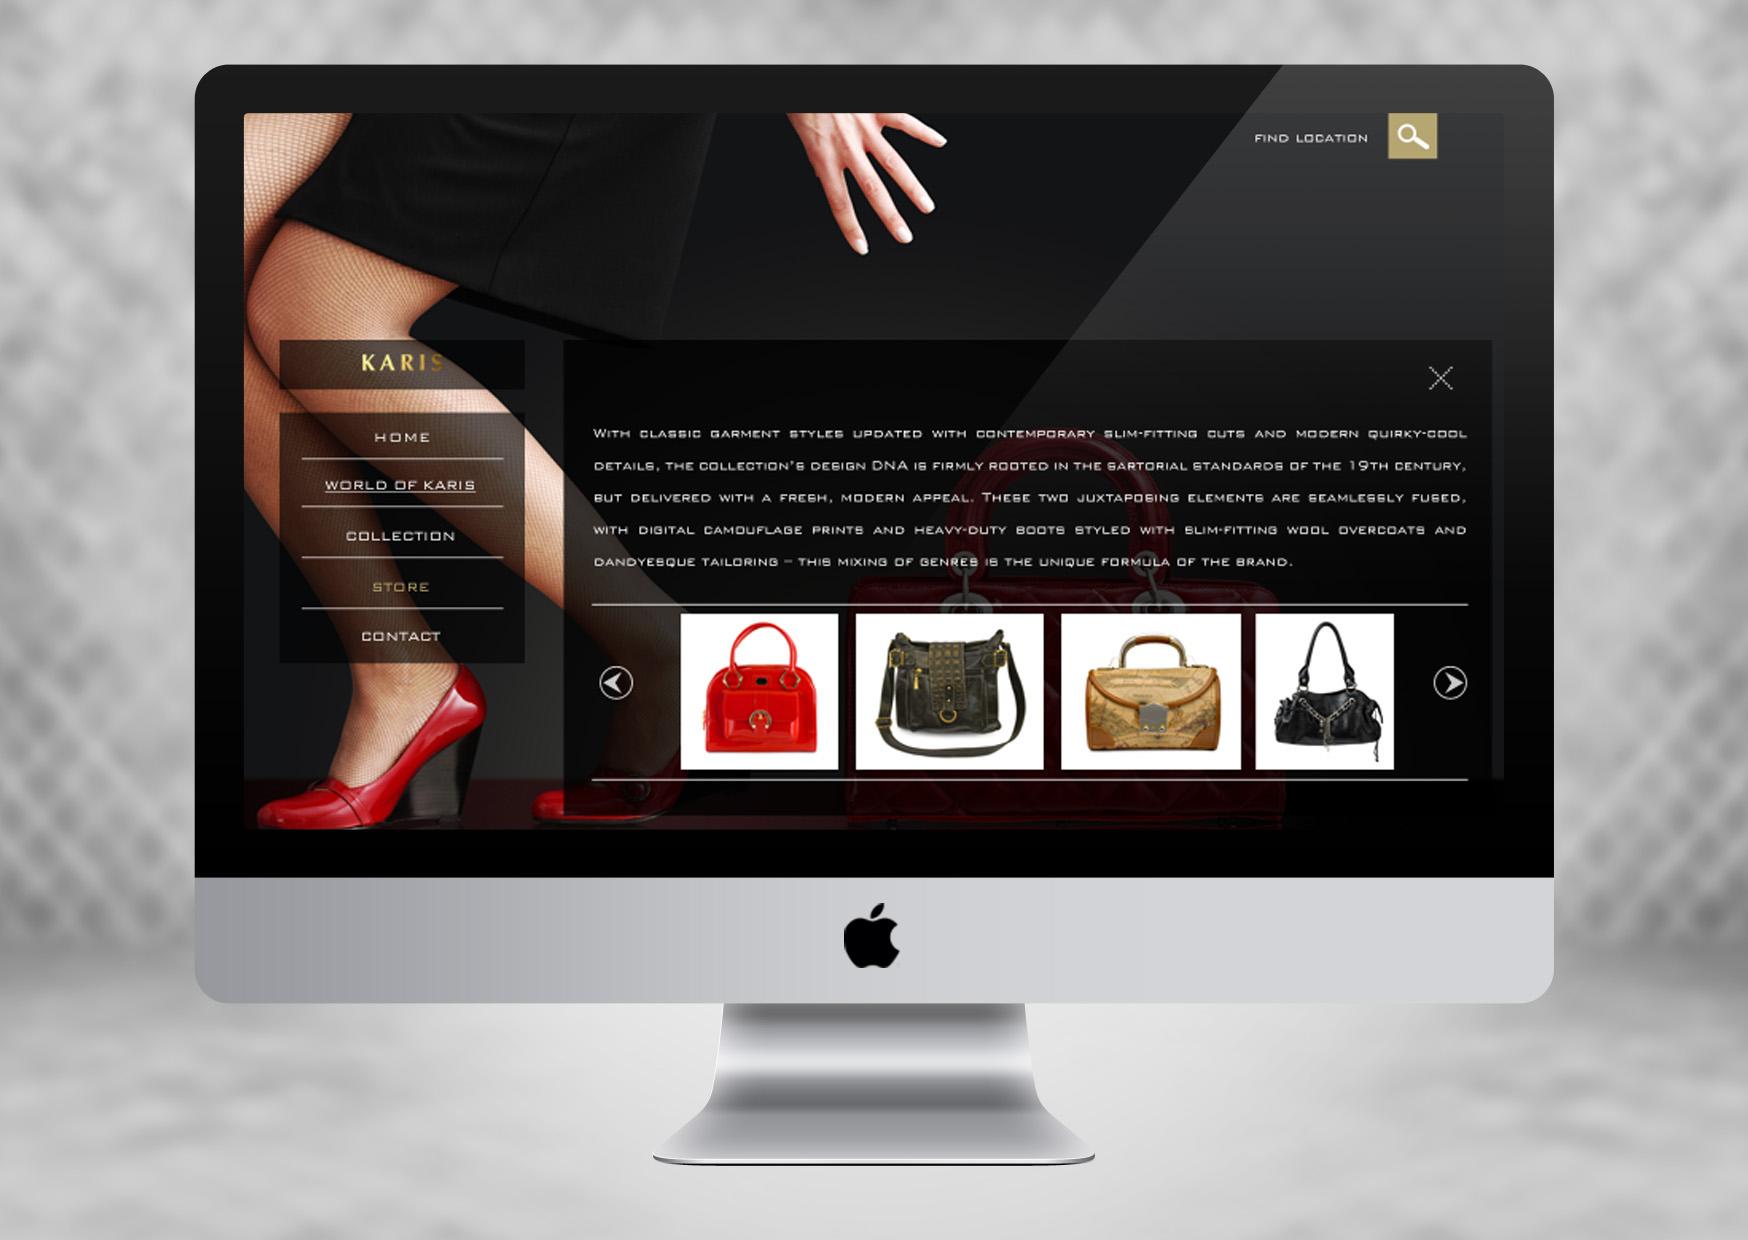 Goede KARIS | Feel The Luxury Lifestyle on Behance RP-02